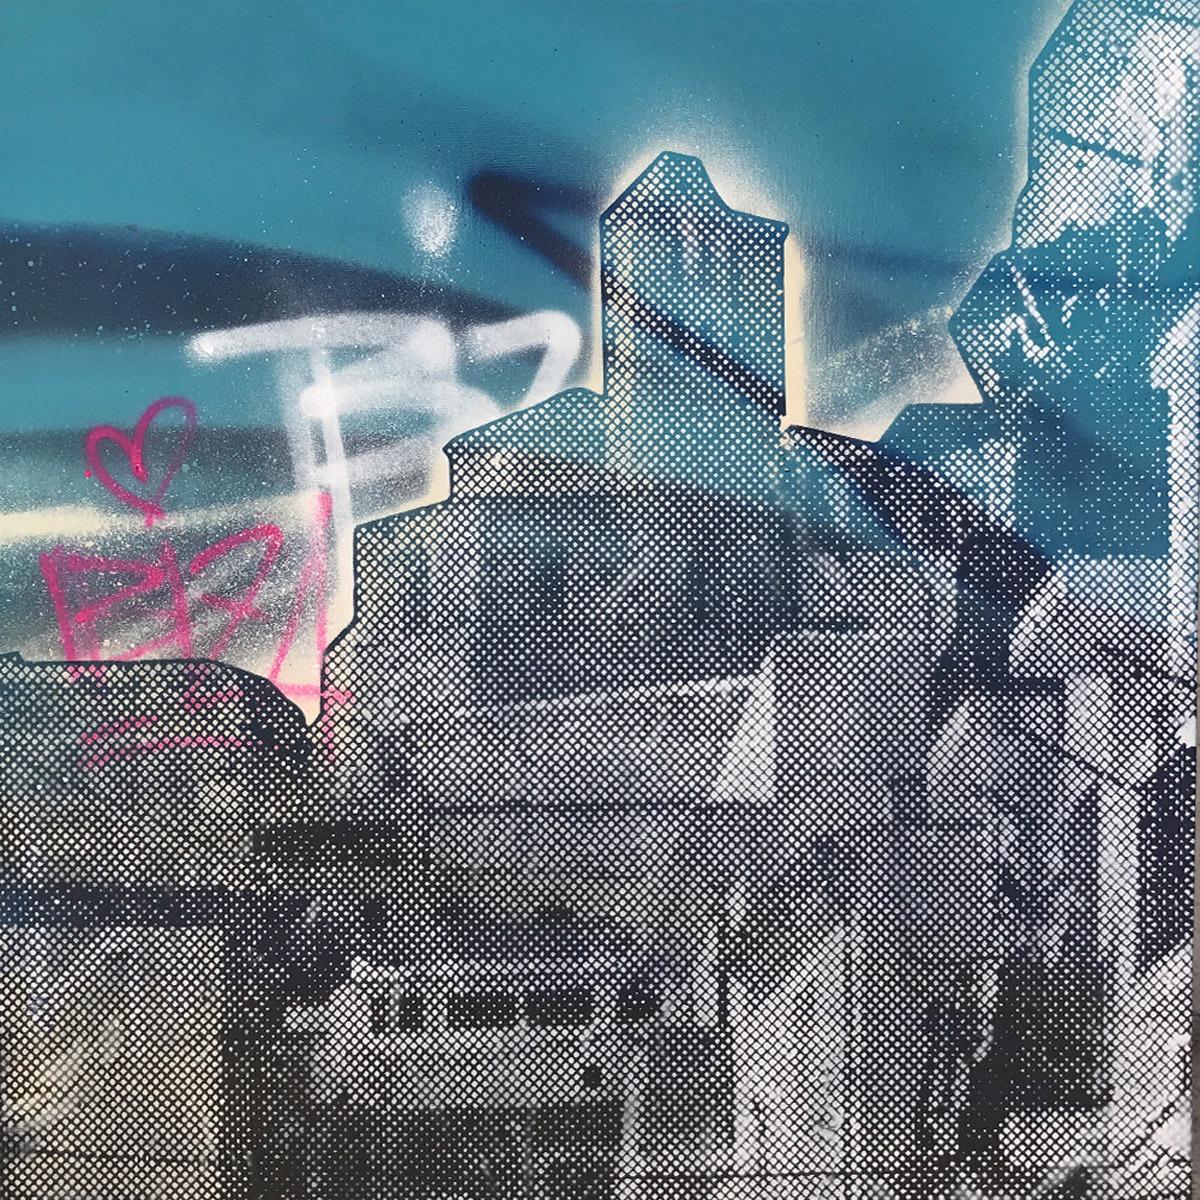 graffitiauftrag-graffitikuenstler-artmos4-leinand-graffiti-ibiza-bfree-eivissa